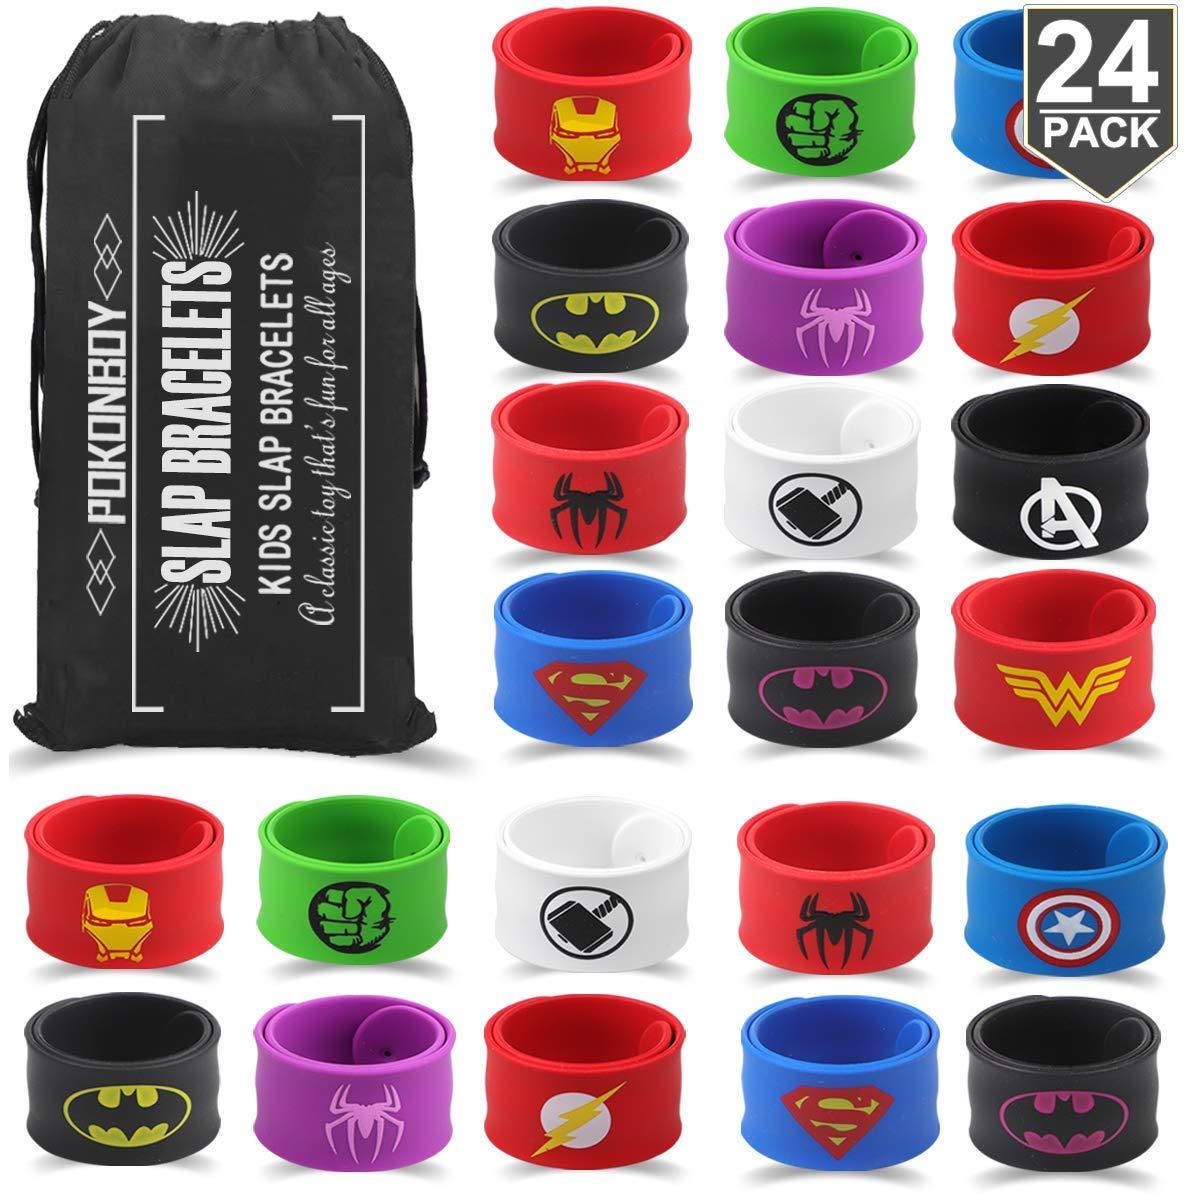 POKONBOY Superhero Slap Bracelets for Kids Party favors - 24 Pack Slap Bracelets for Boys Girls Kids Super Hero Birthday Party Favors Supplies Carnival Boys Prizes by POKONBOY (Image #1)